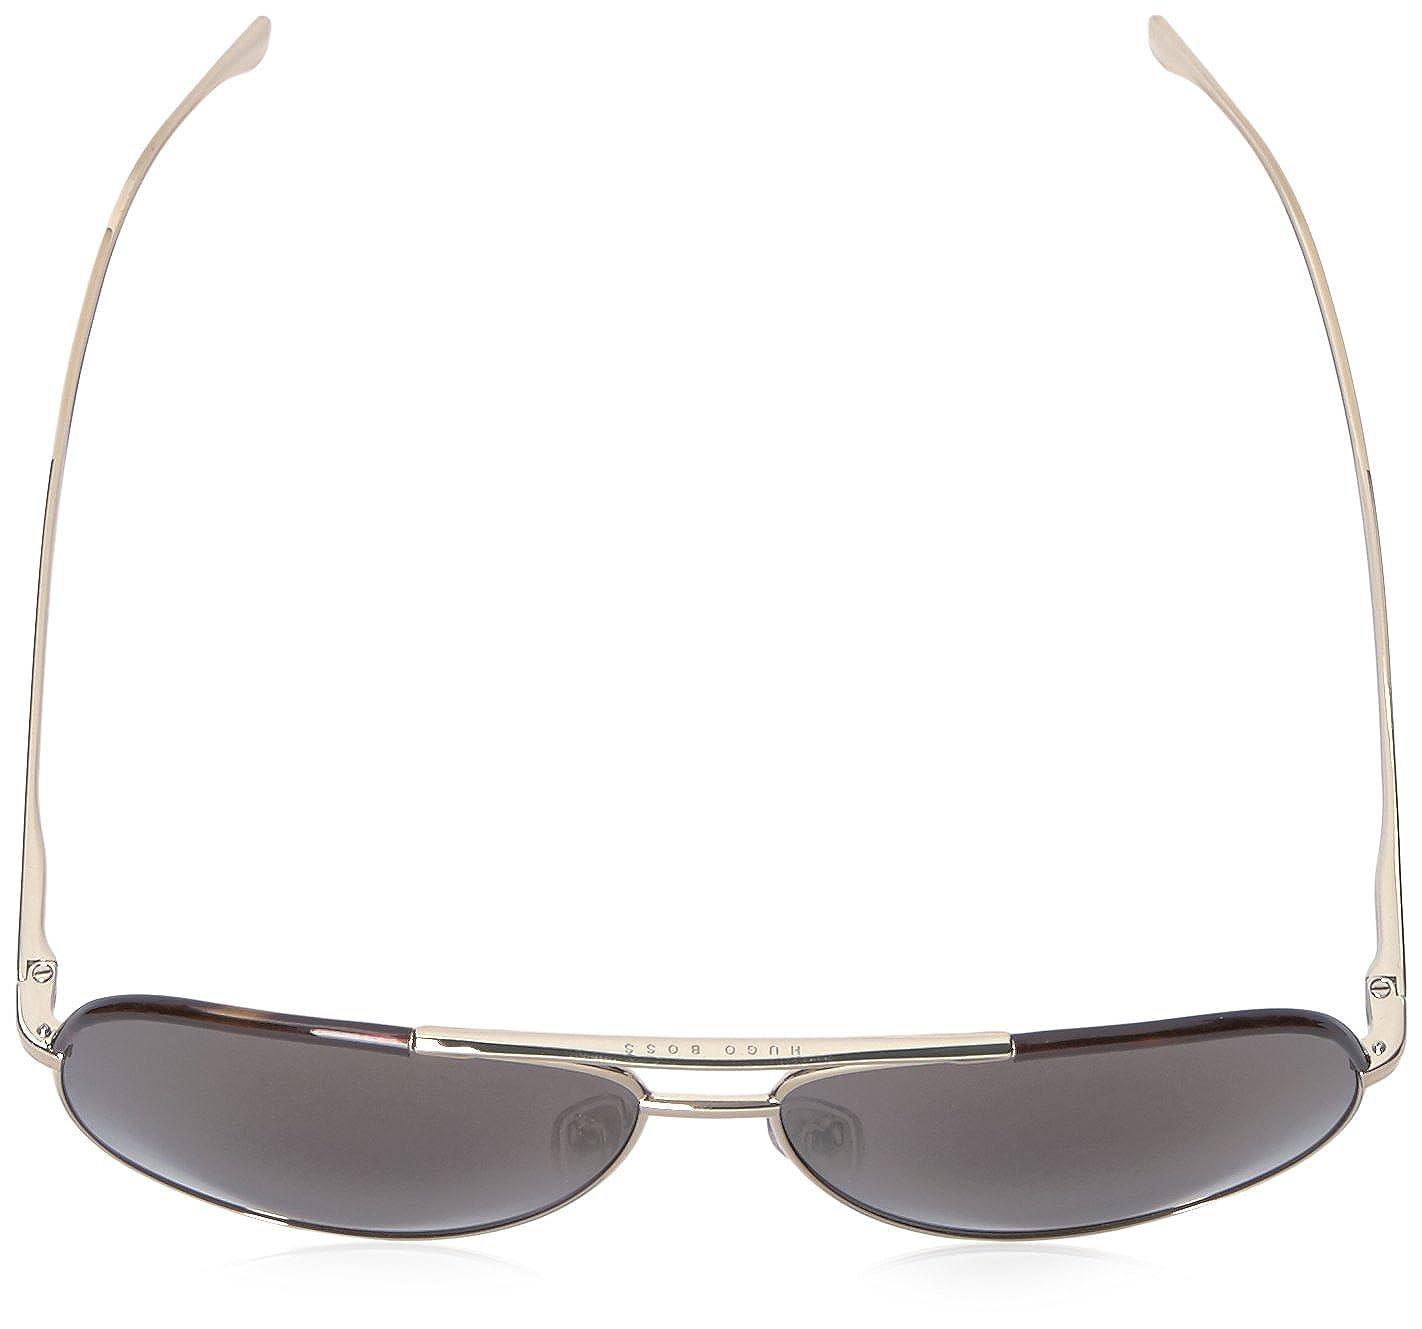 Hugo Boss Boss 0782/S HJ 0I5, Gafas de Sol Unisex-Adulto, Negro (Lt Gold Black/Gun Metal Fl), 60: Amazon.es: Ropa y accesorios